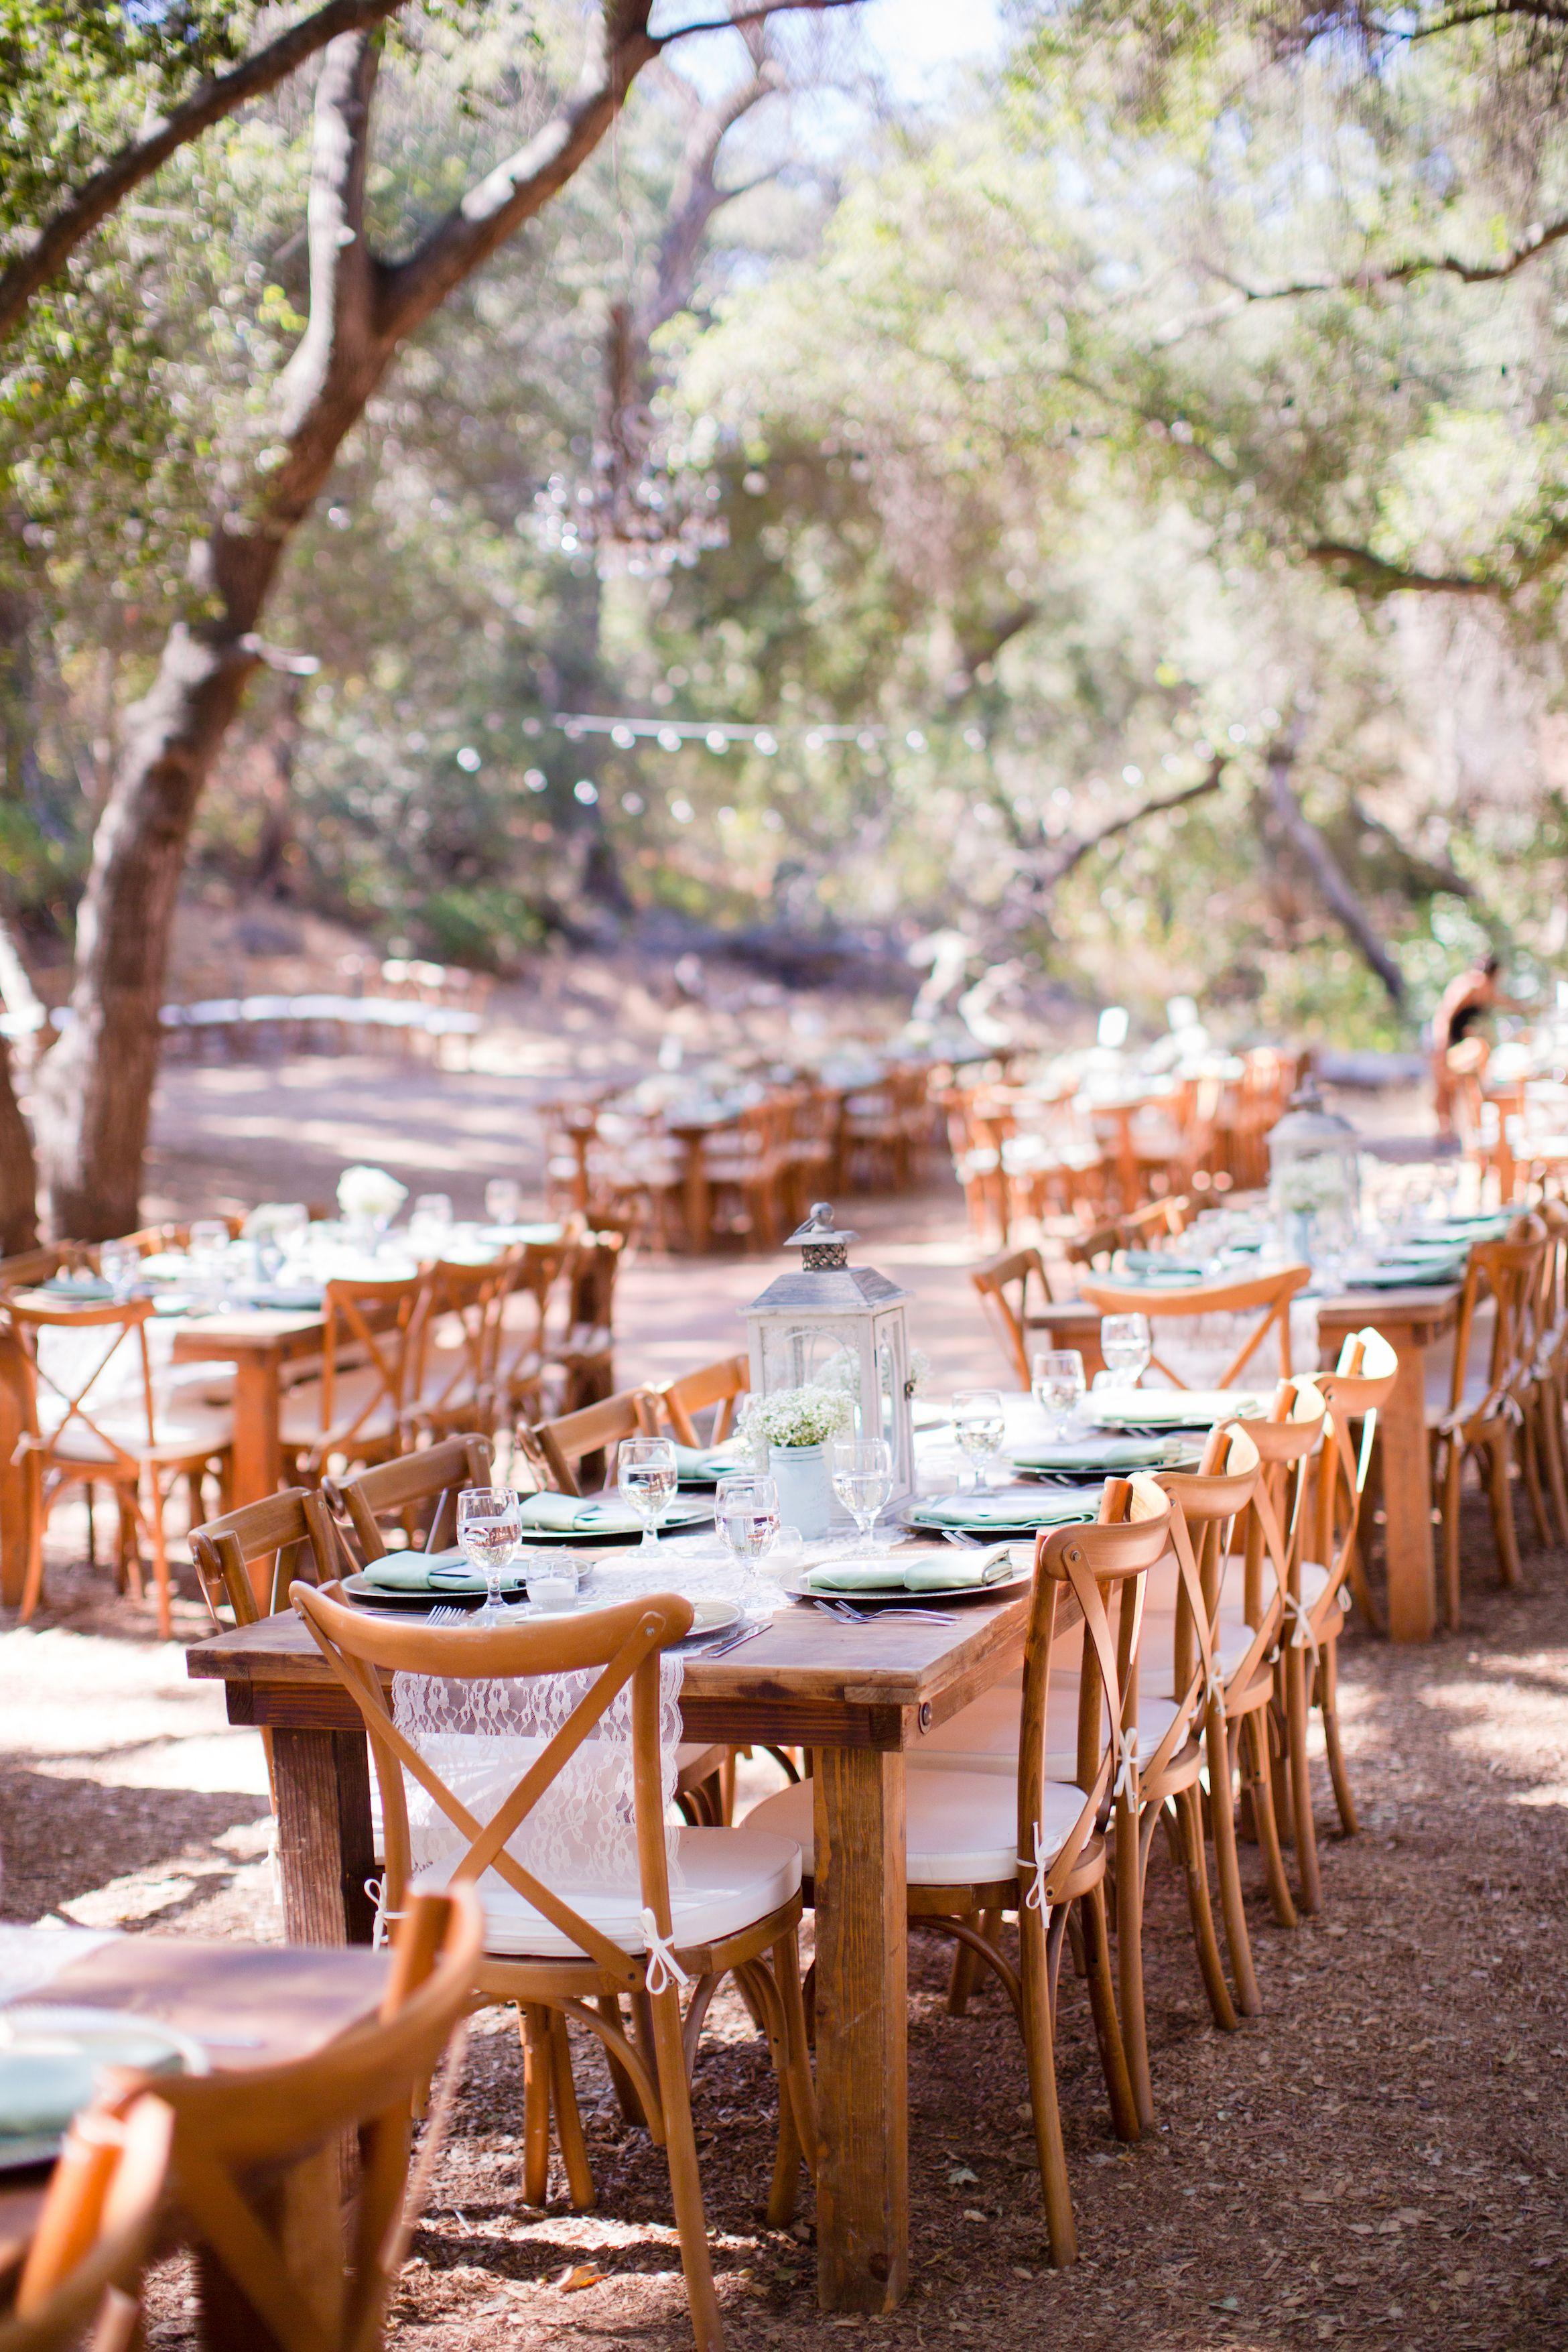 Farm Tables And More San Diego San Diego Wedding Rentals Southern California Wedding Rental Farm Table Wedding Wedding Themes Outdoor Wedding Themes Rustic